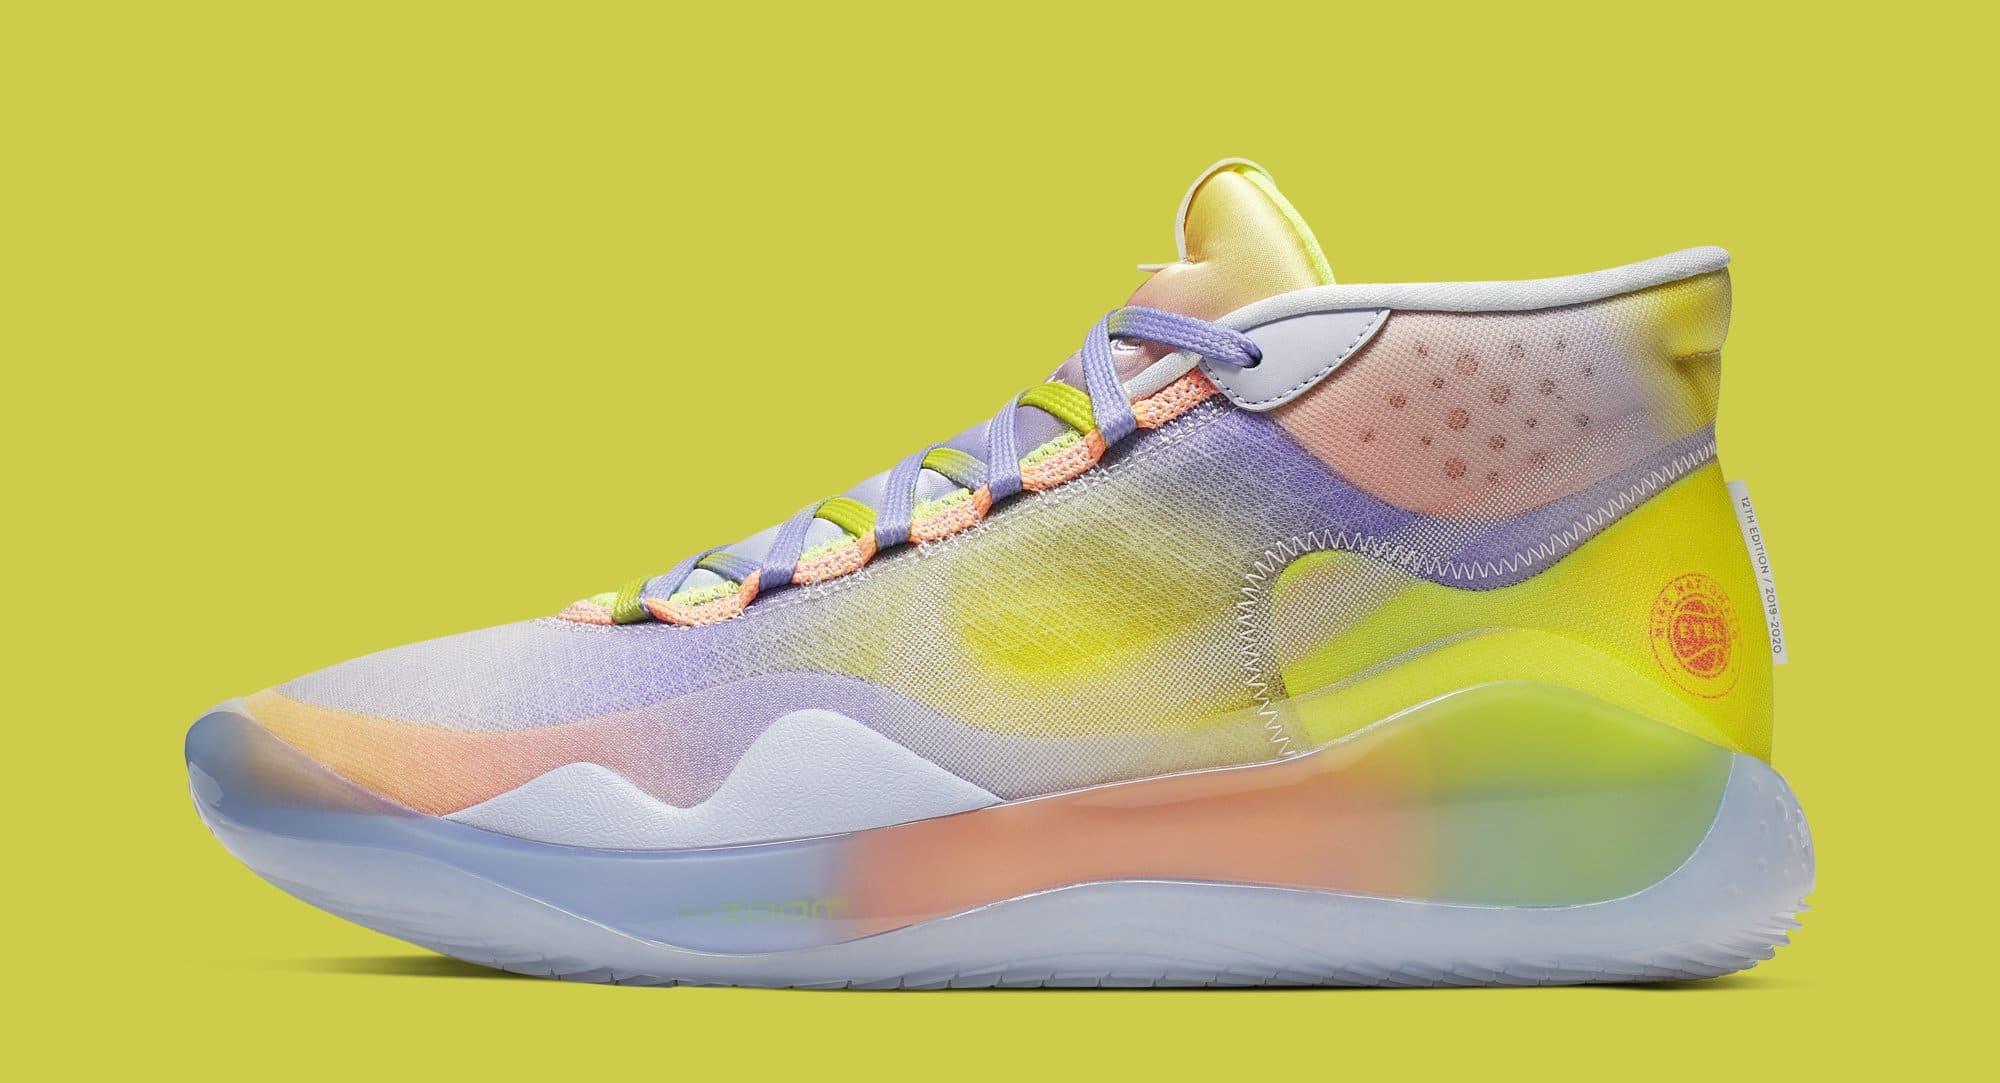 Nike KD 12 'EYBL' CK1201-900 (Lateral)